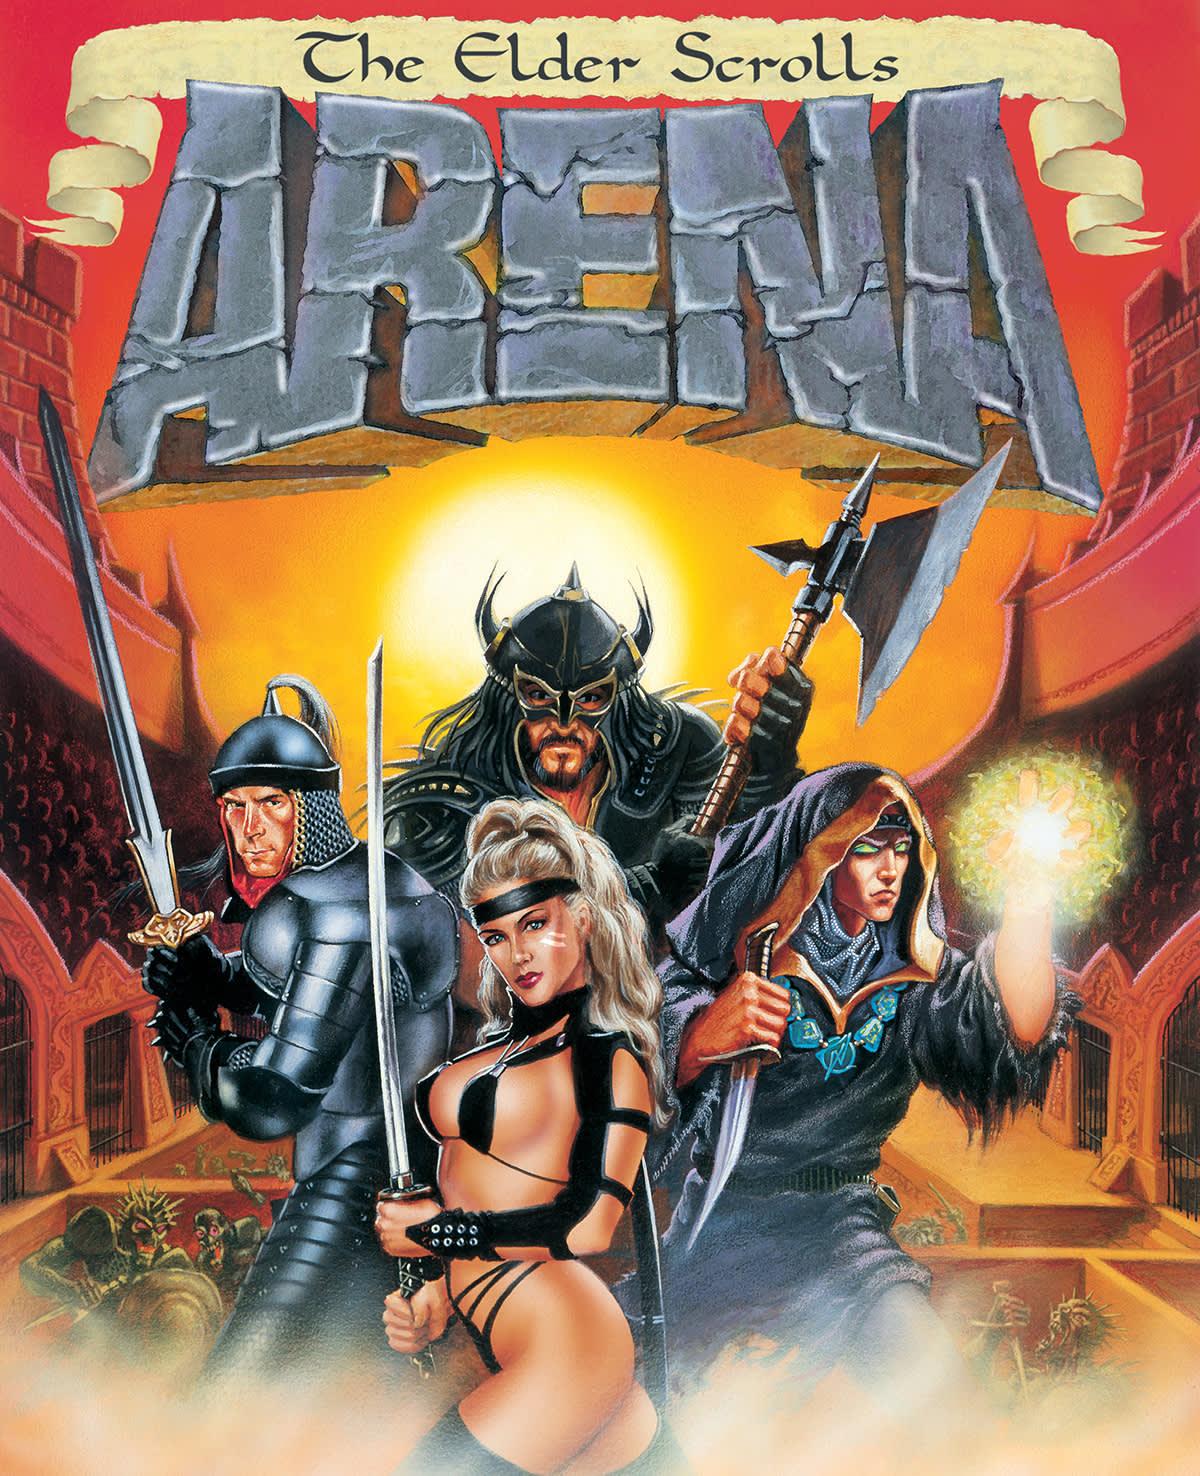 The Elder Scrolls | The Elder Scrolls: Arena